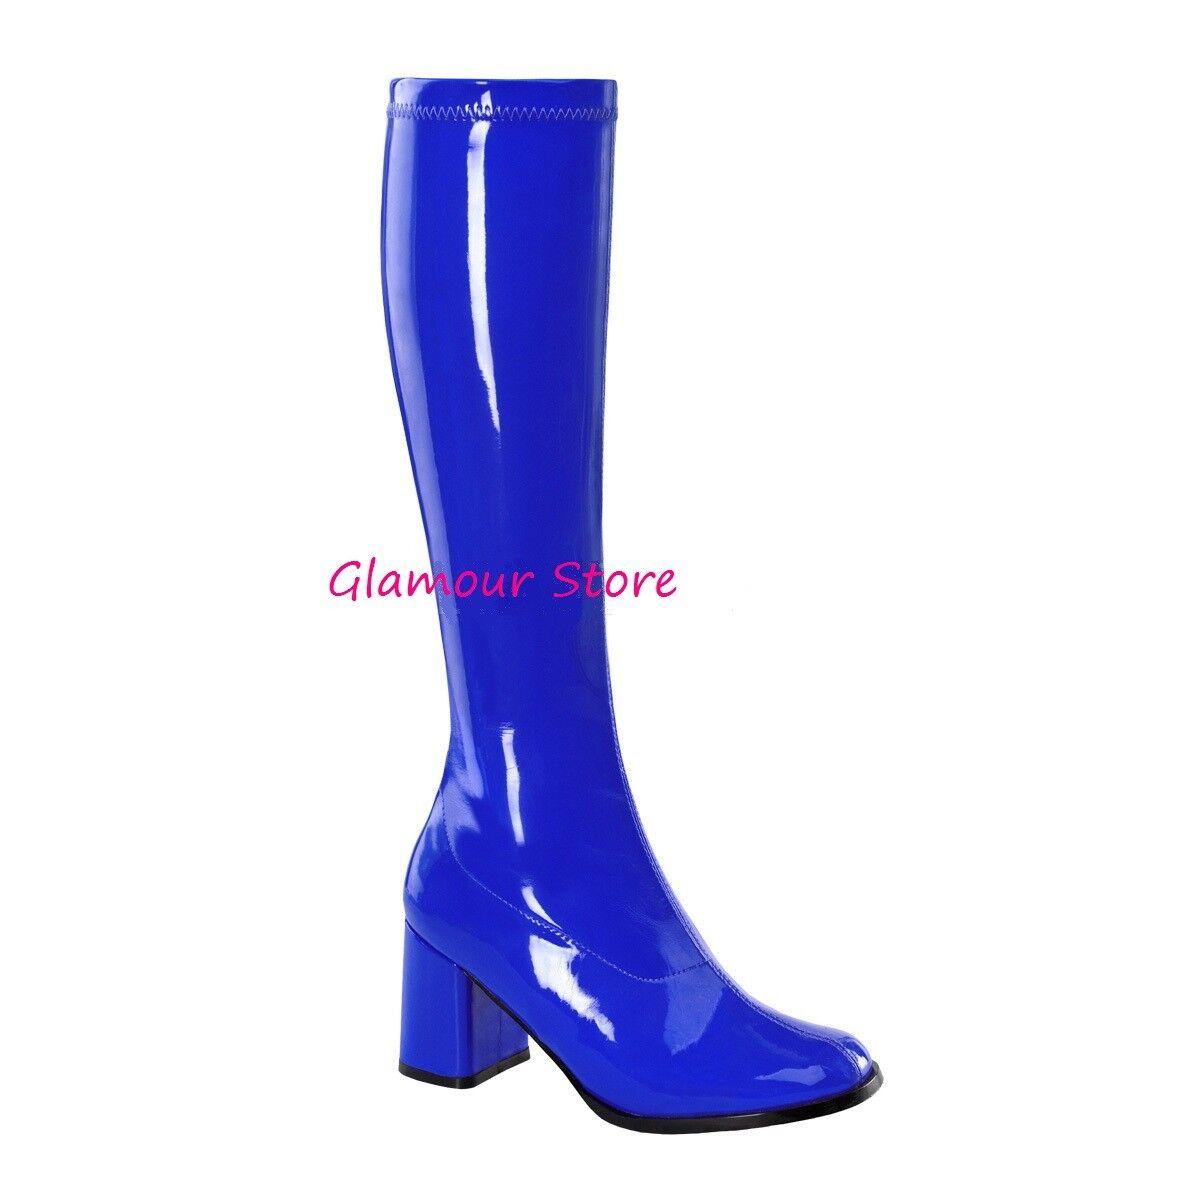 Sexy STIVALI tacco 7,5 BLU NAVY LUCIDO dal 35 al 46 zip scarpe fashion GLAMOUR